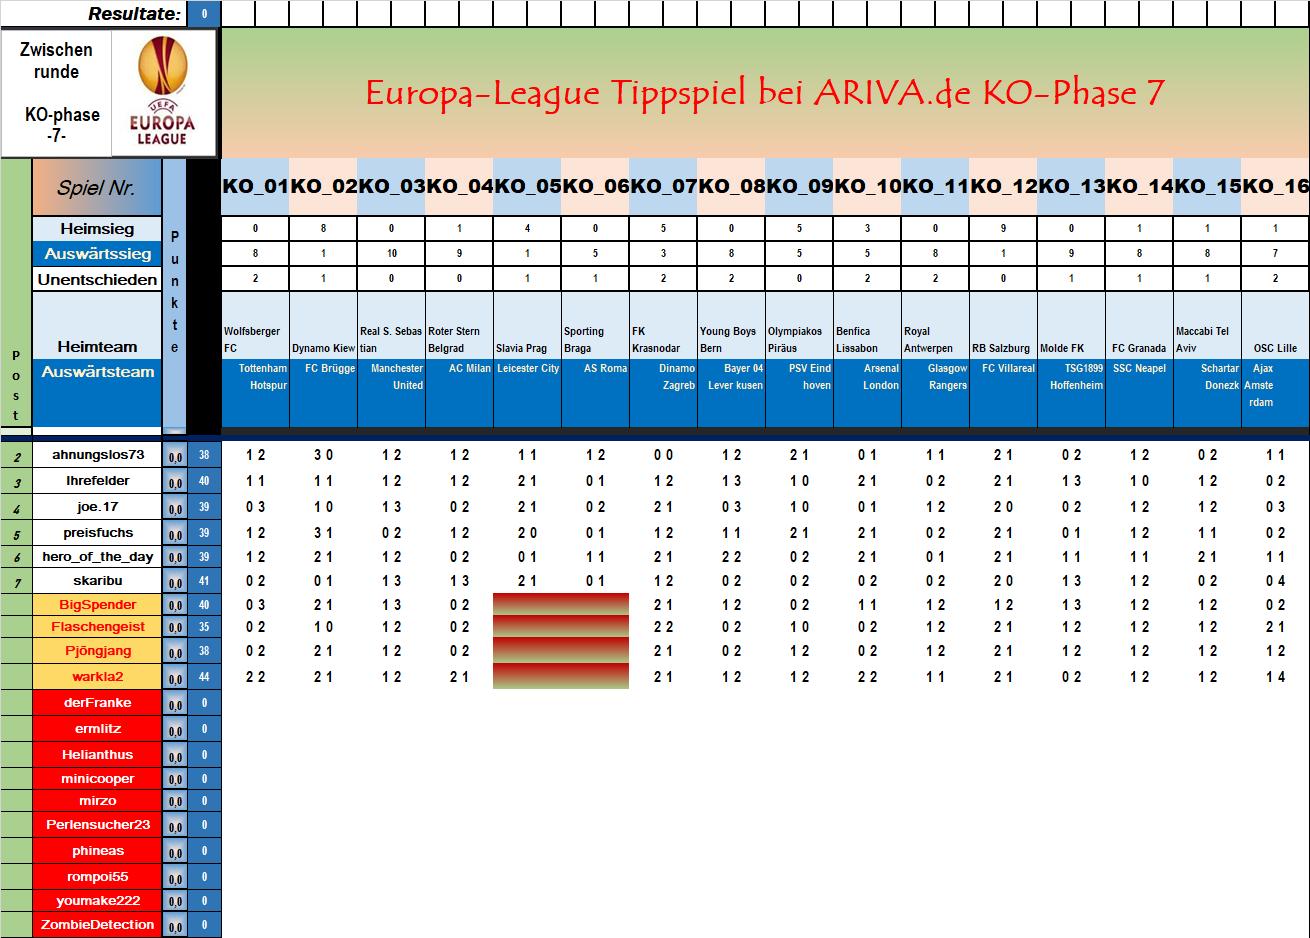 euro_league_runde_7_erste_tipps.png